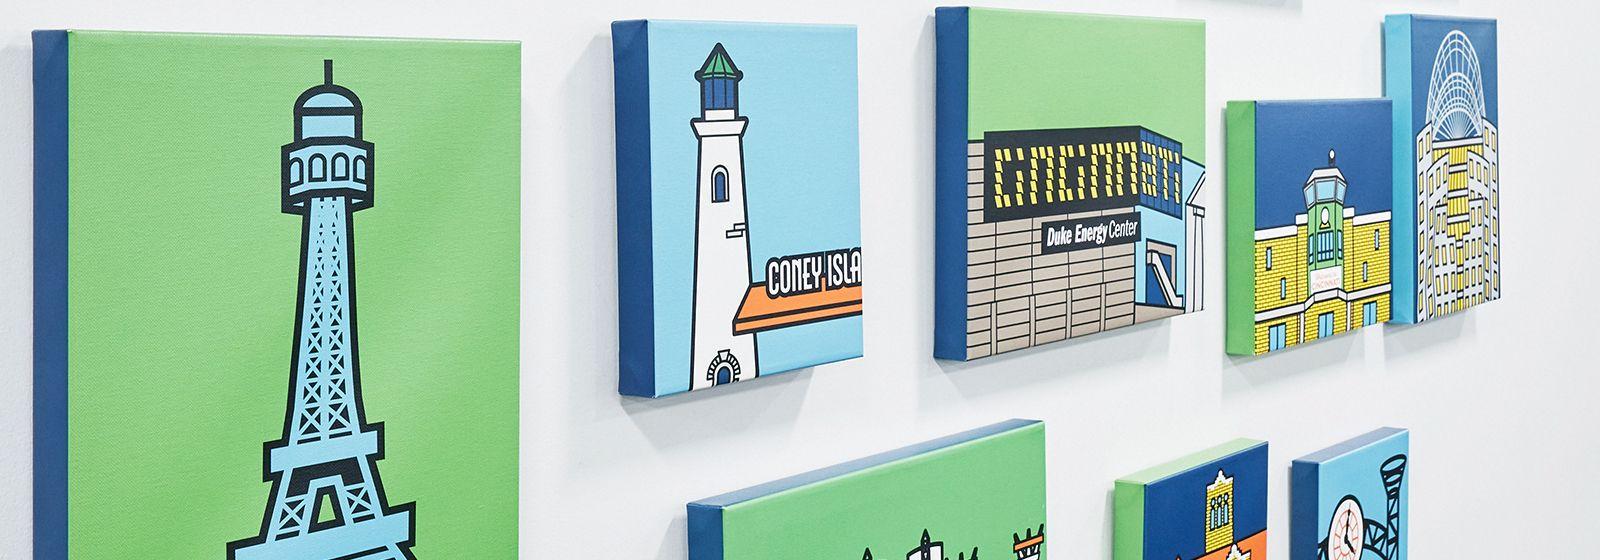 Paintings unite communities at Duke Energy service center